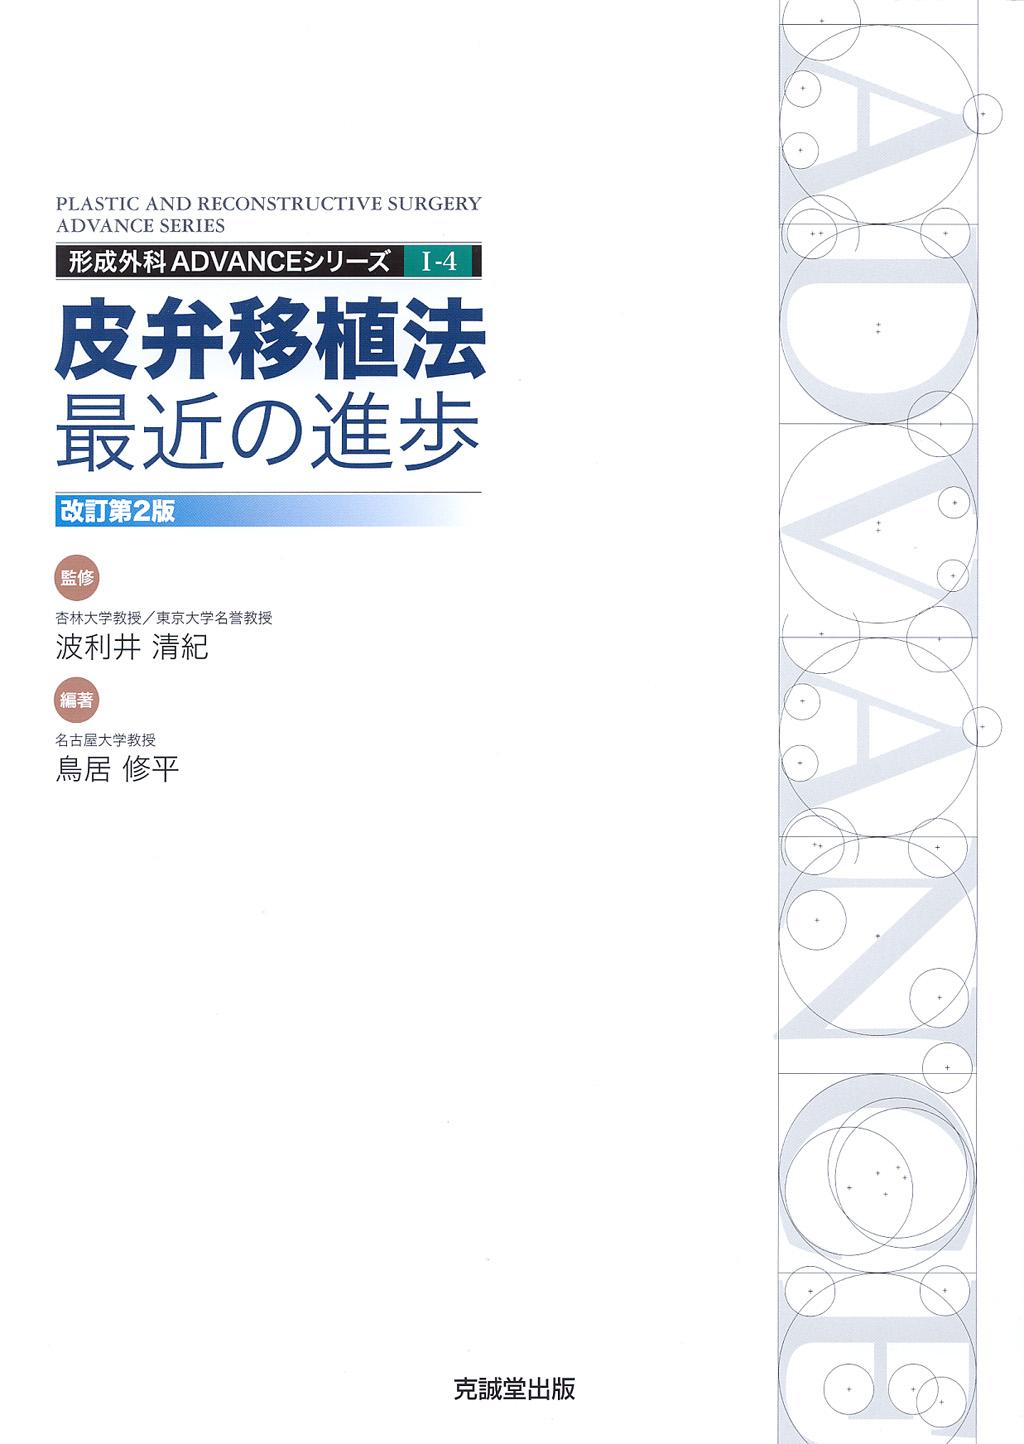 ADVANCE SERIES I-4 皮弁移植法:最近の進歩【改訂第2版】